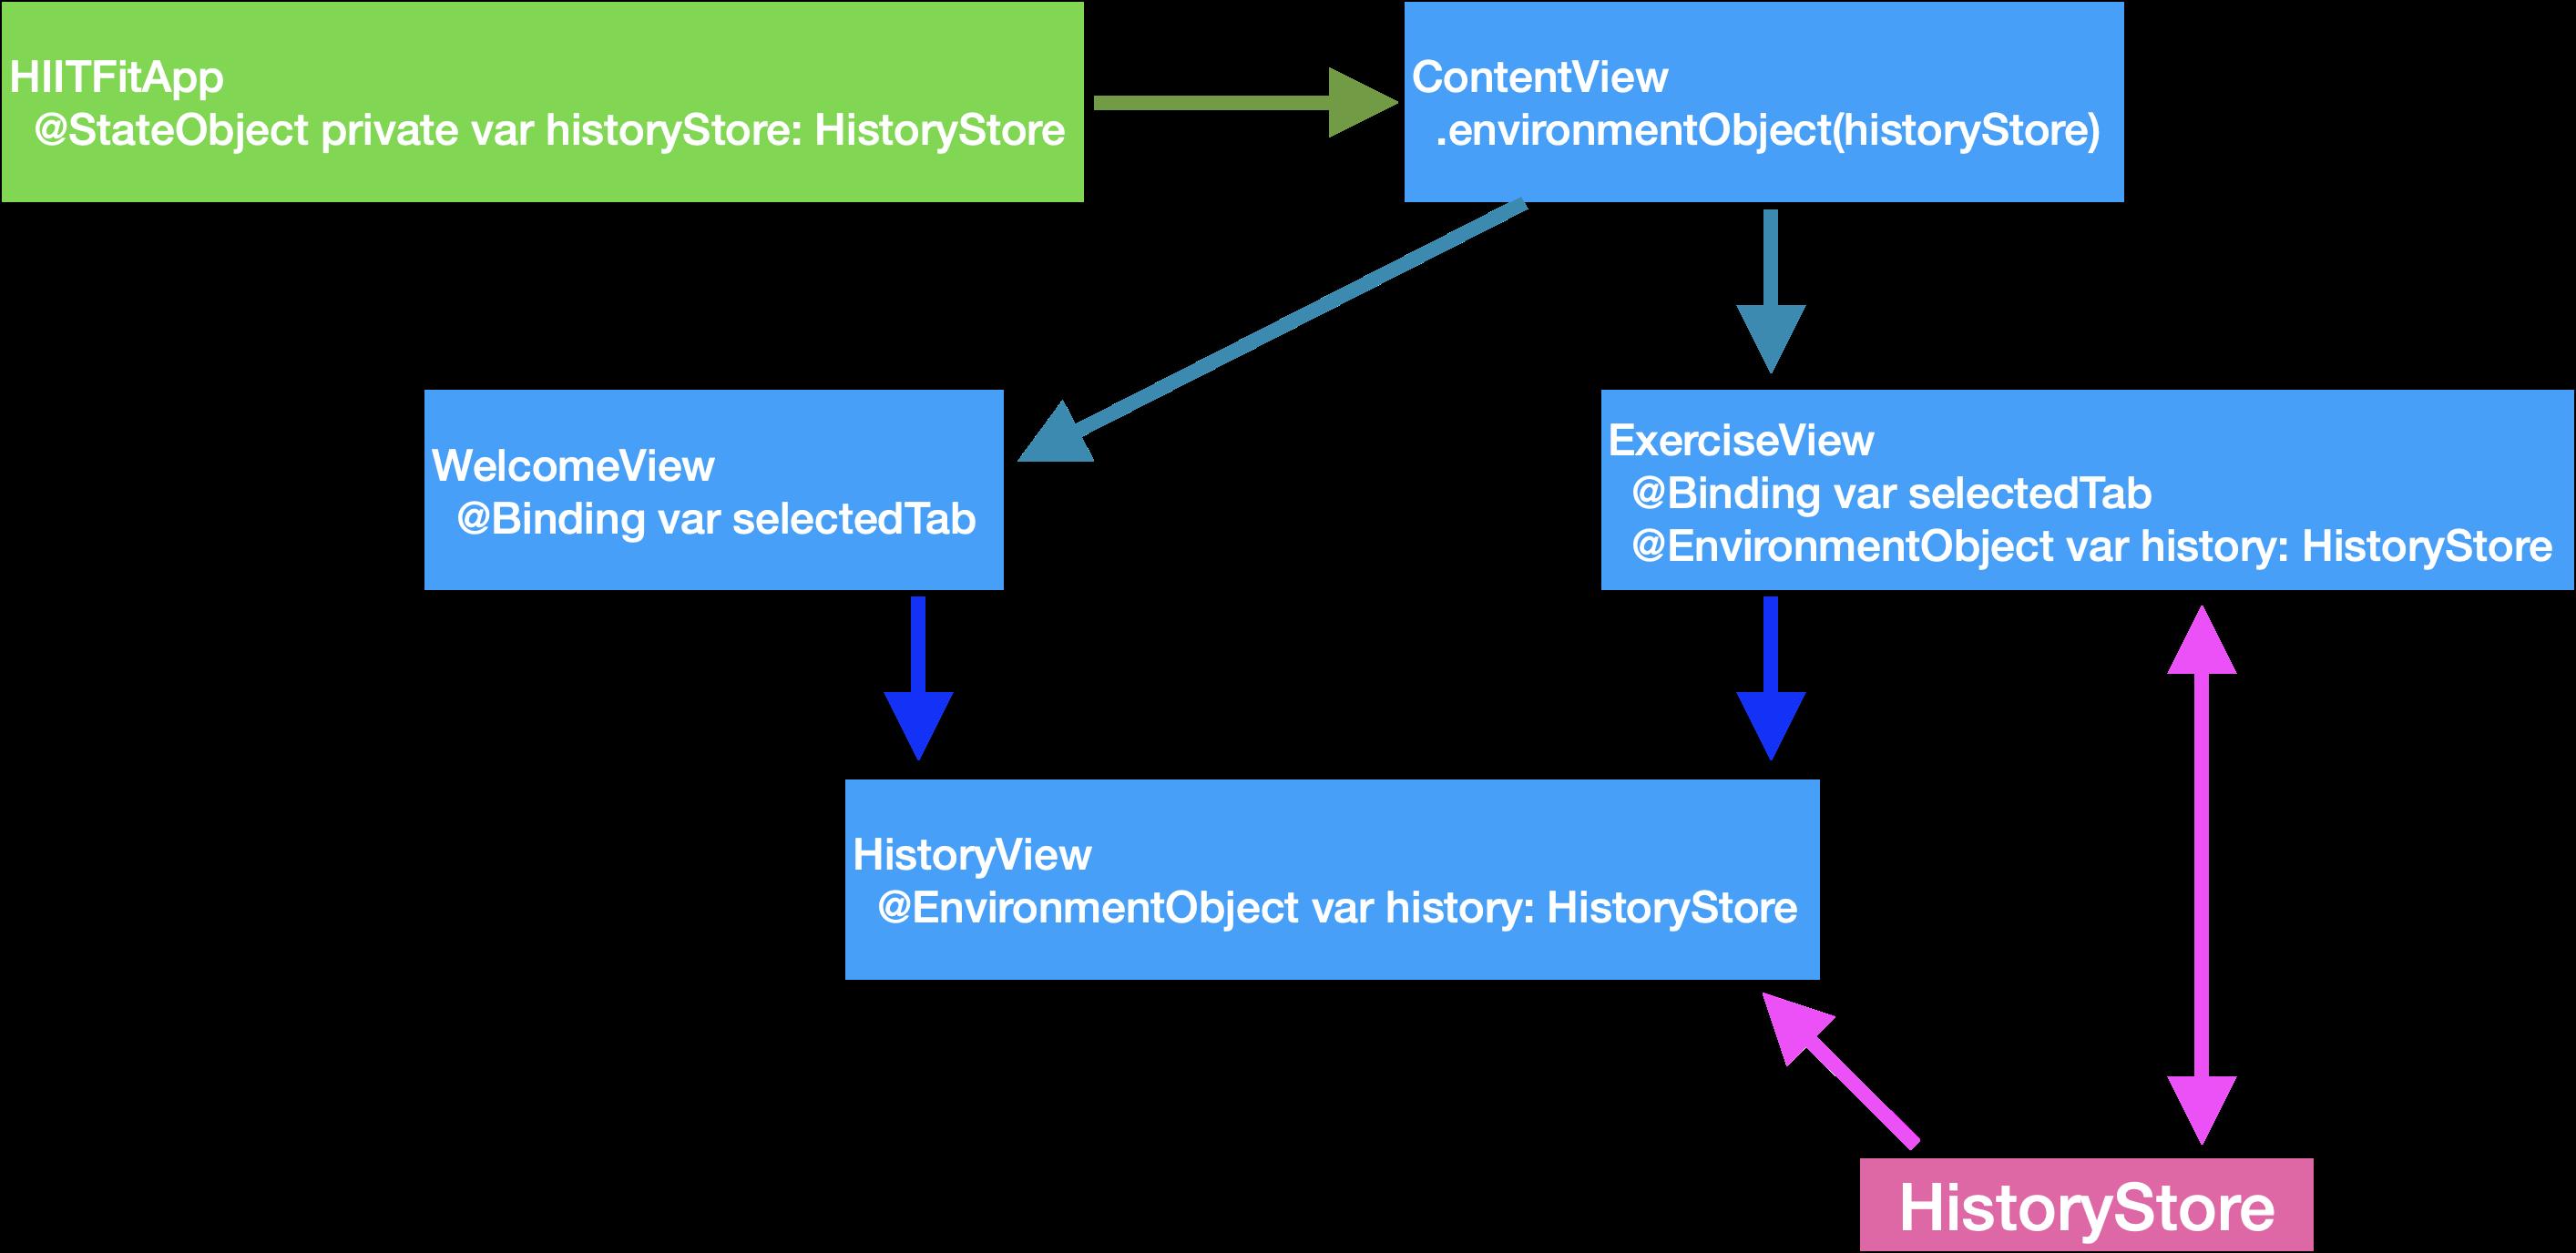 HIITFit: HistoryStore shared as EnvironmentObject